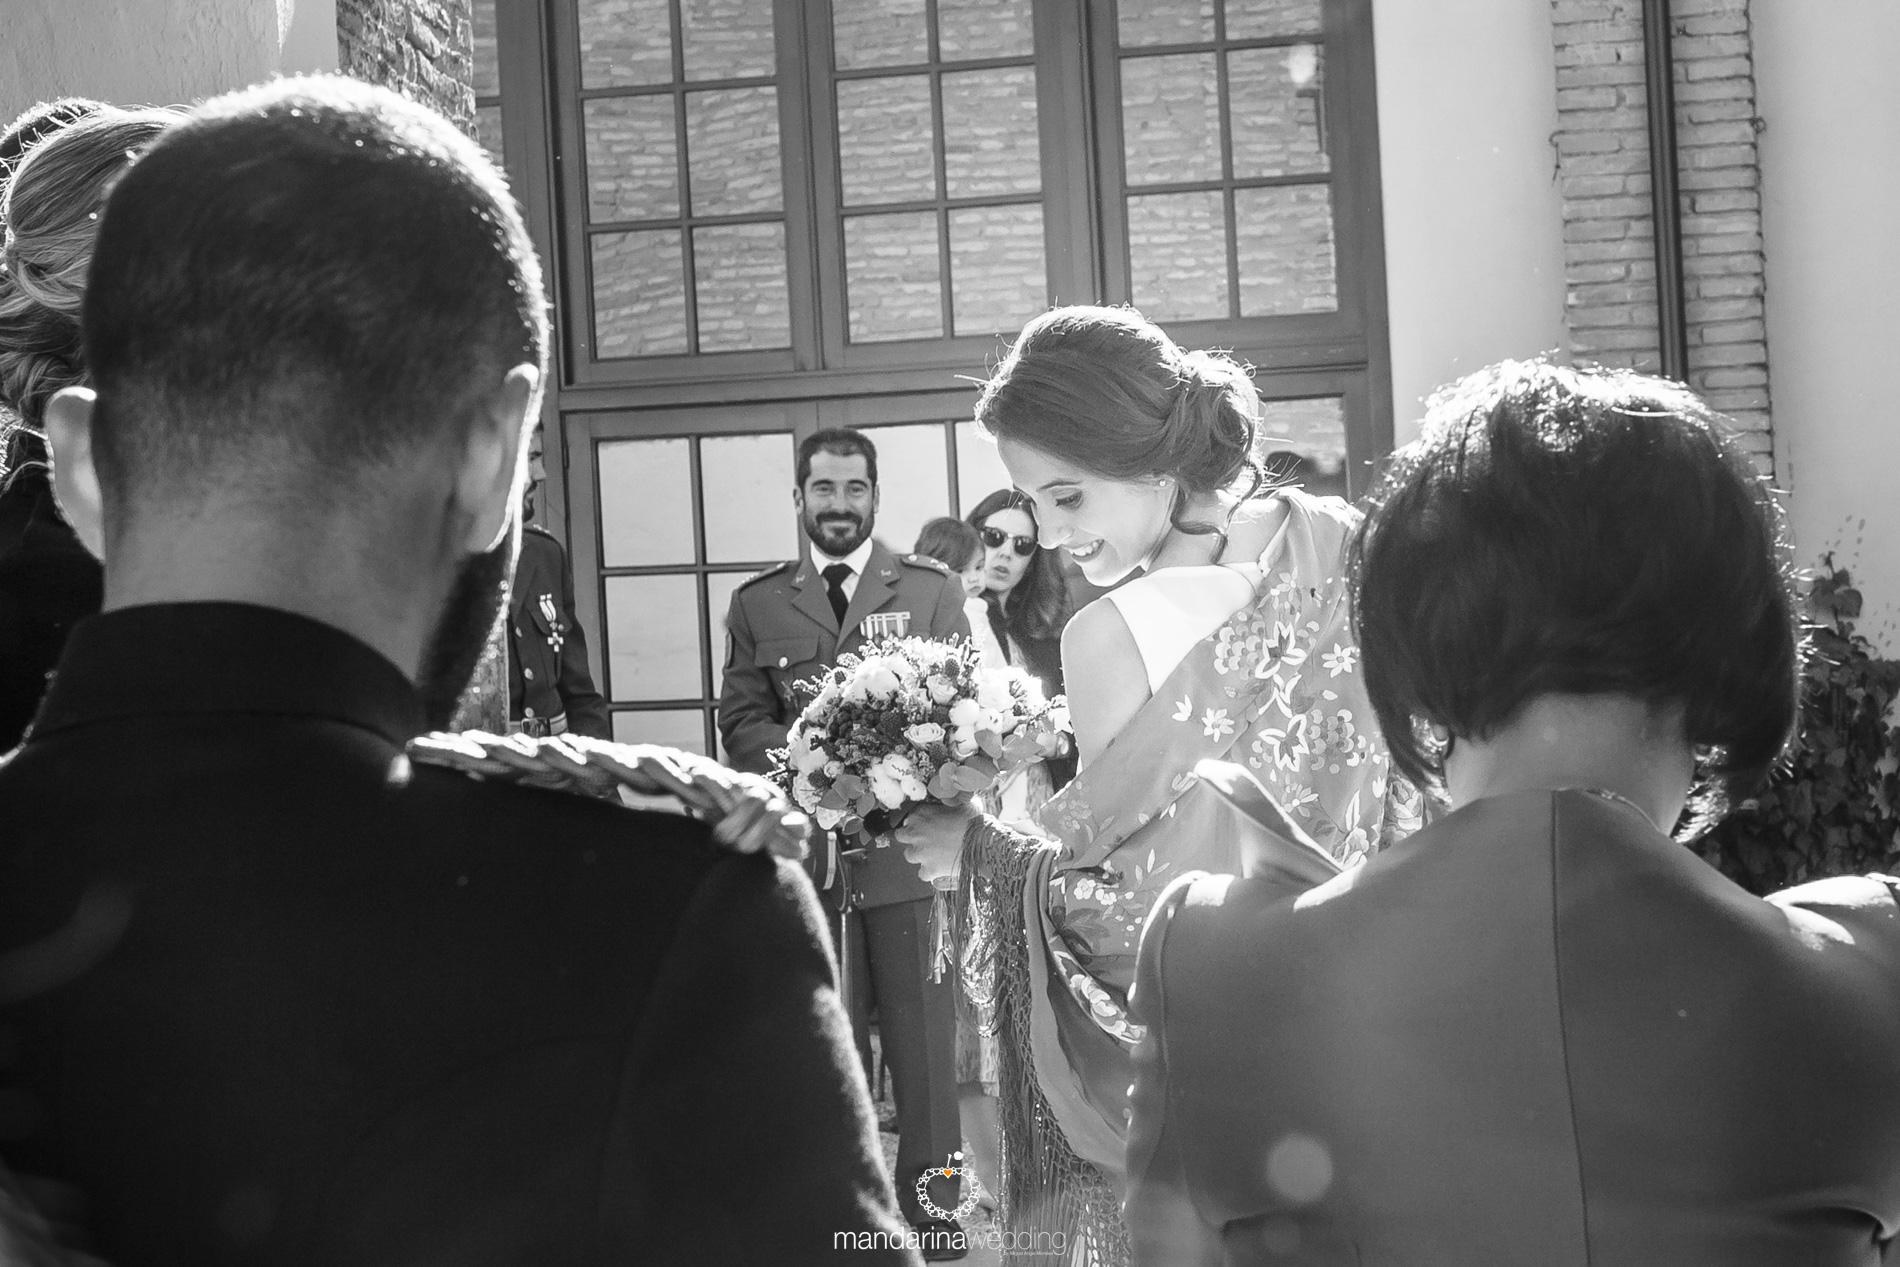 mandarina wedding, fotografos de boda, fotografo boda soria, fotografo boda barcelona, fotografo boda Madrid, fotógrafo boda lerida_35